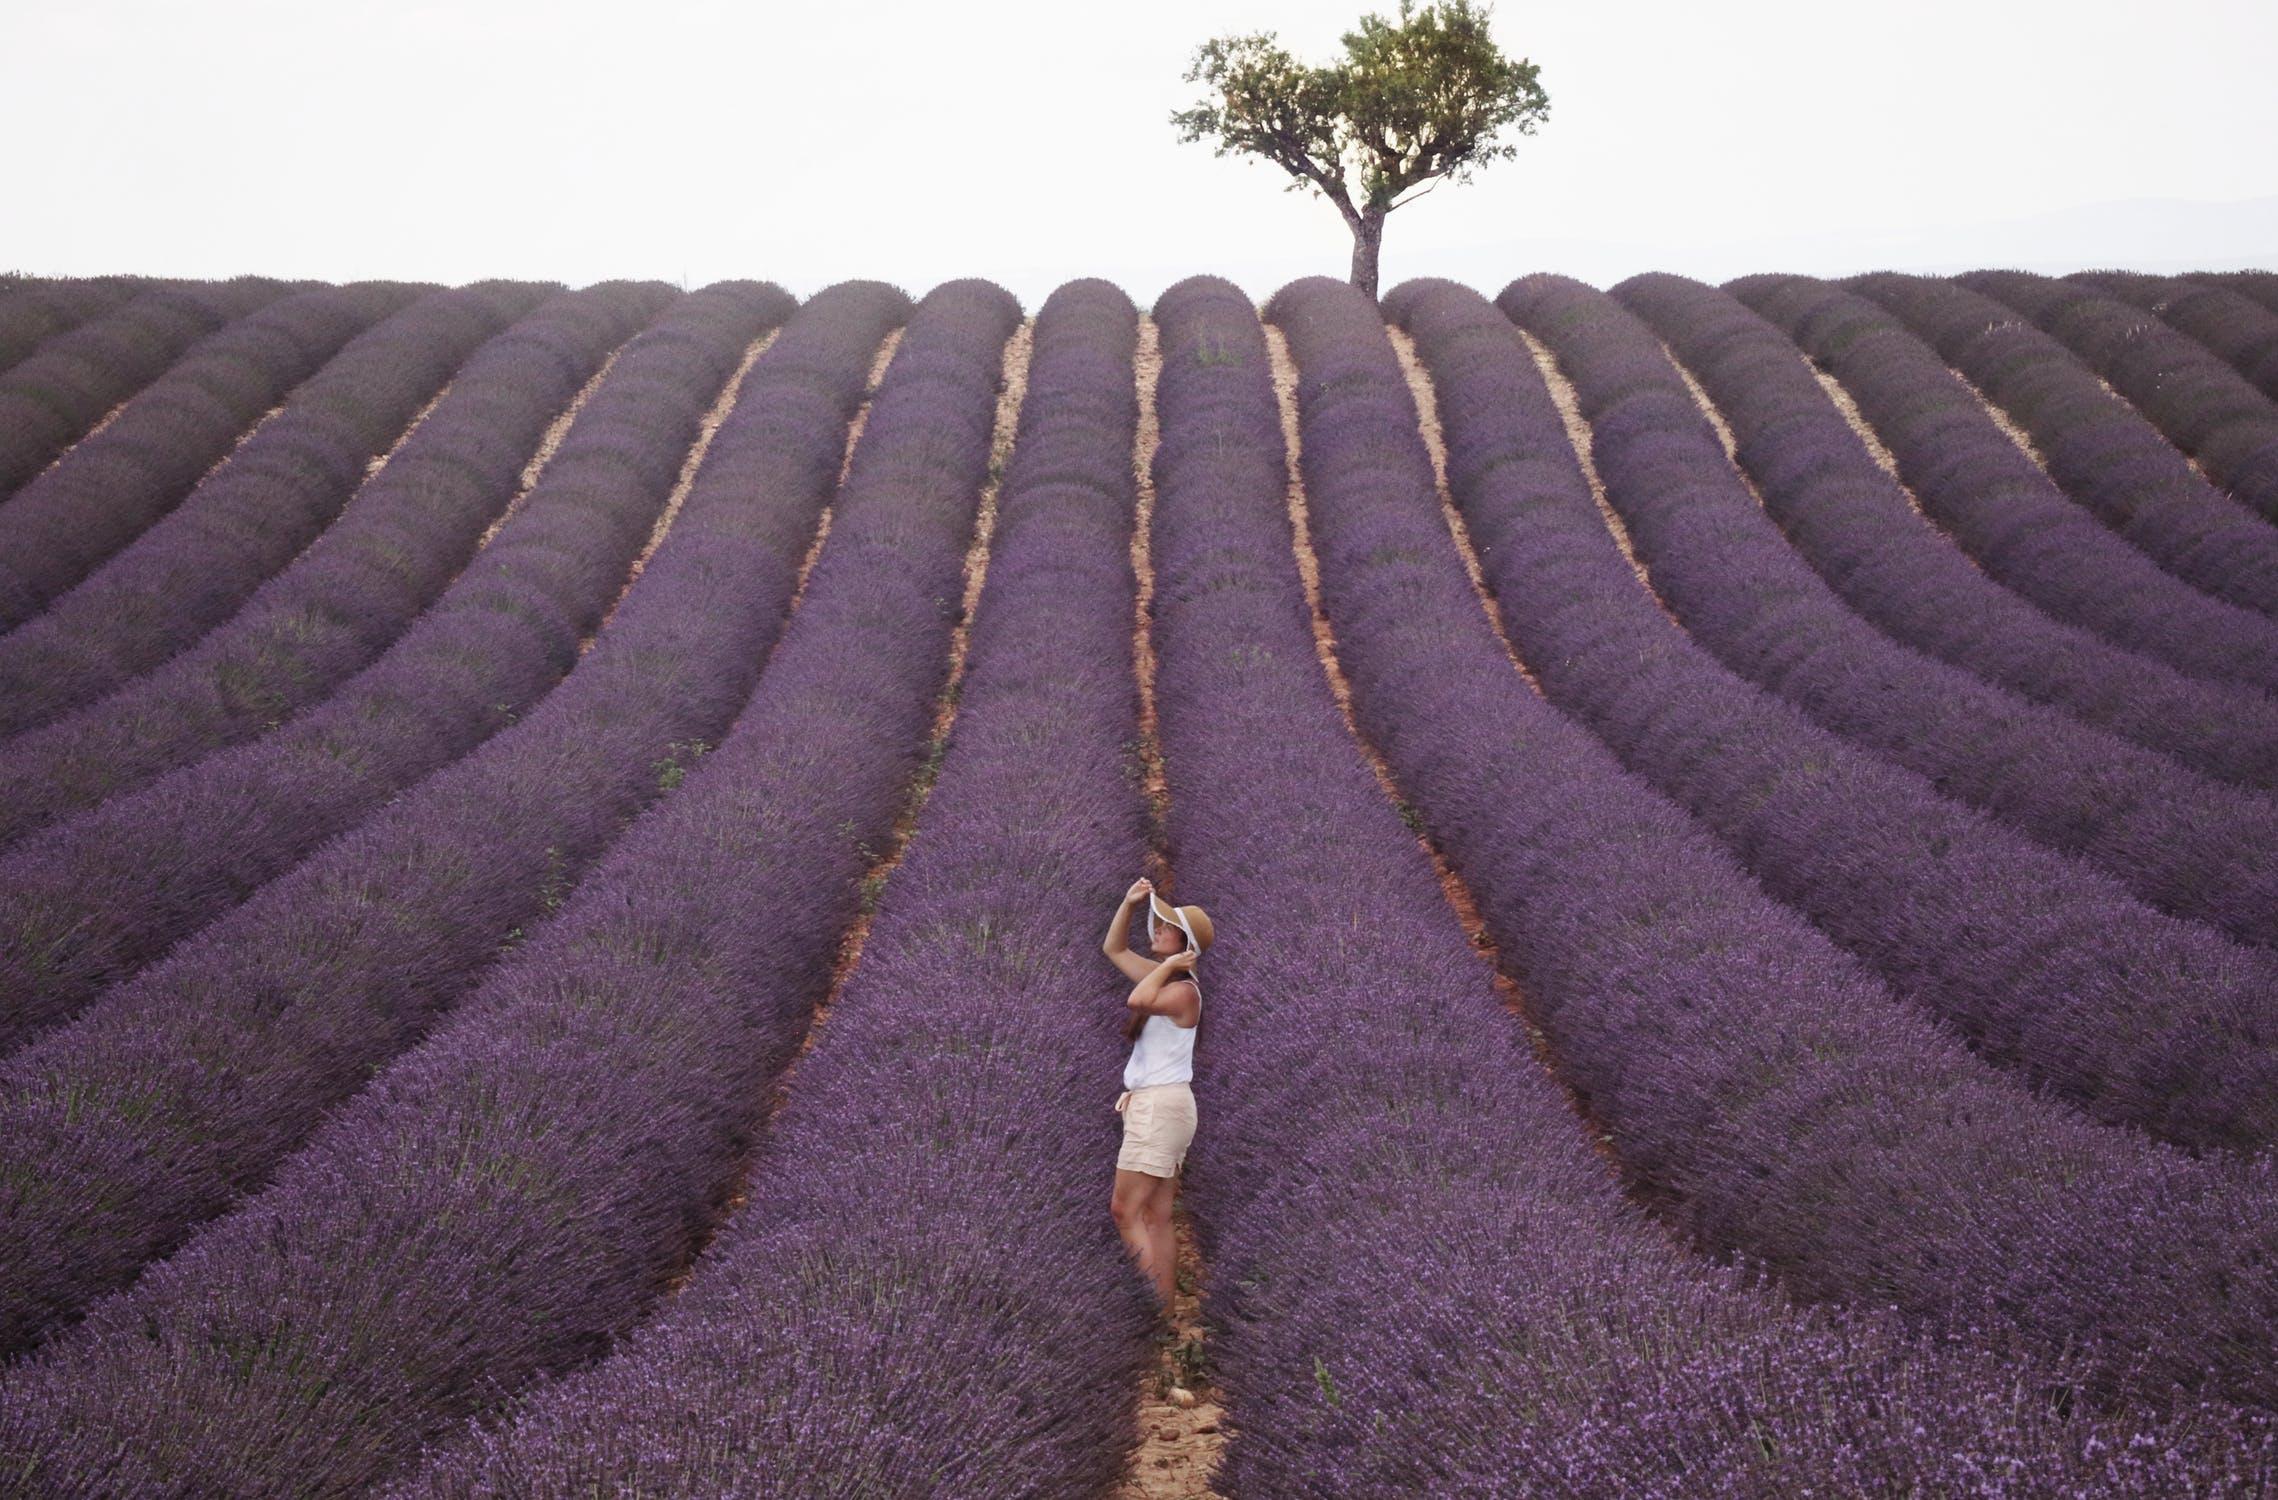 woman standing in field of lavender - lavender essential oil farm